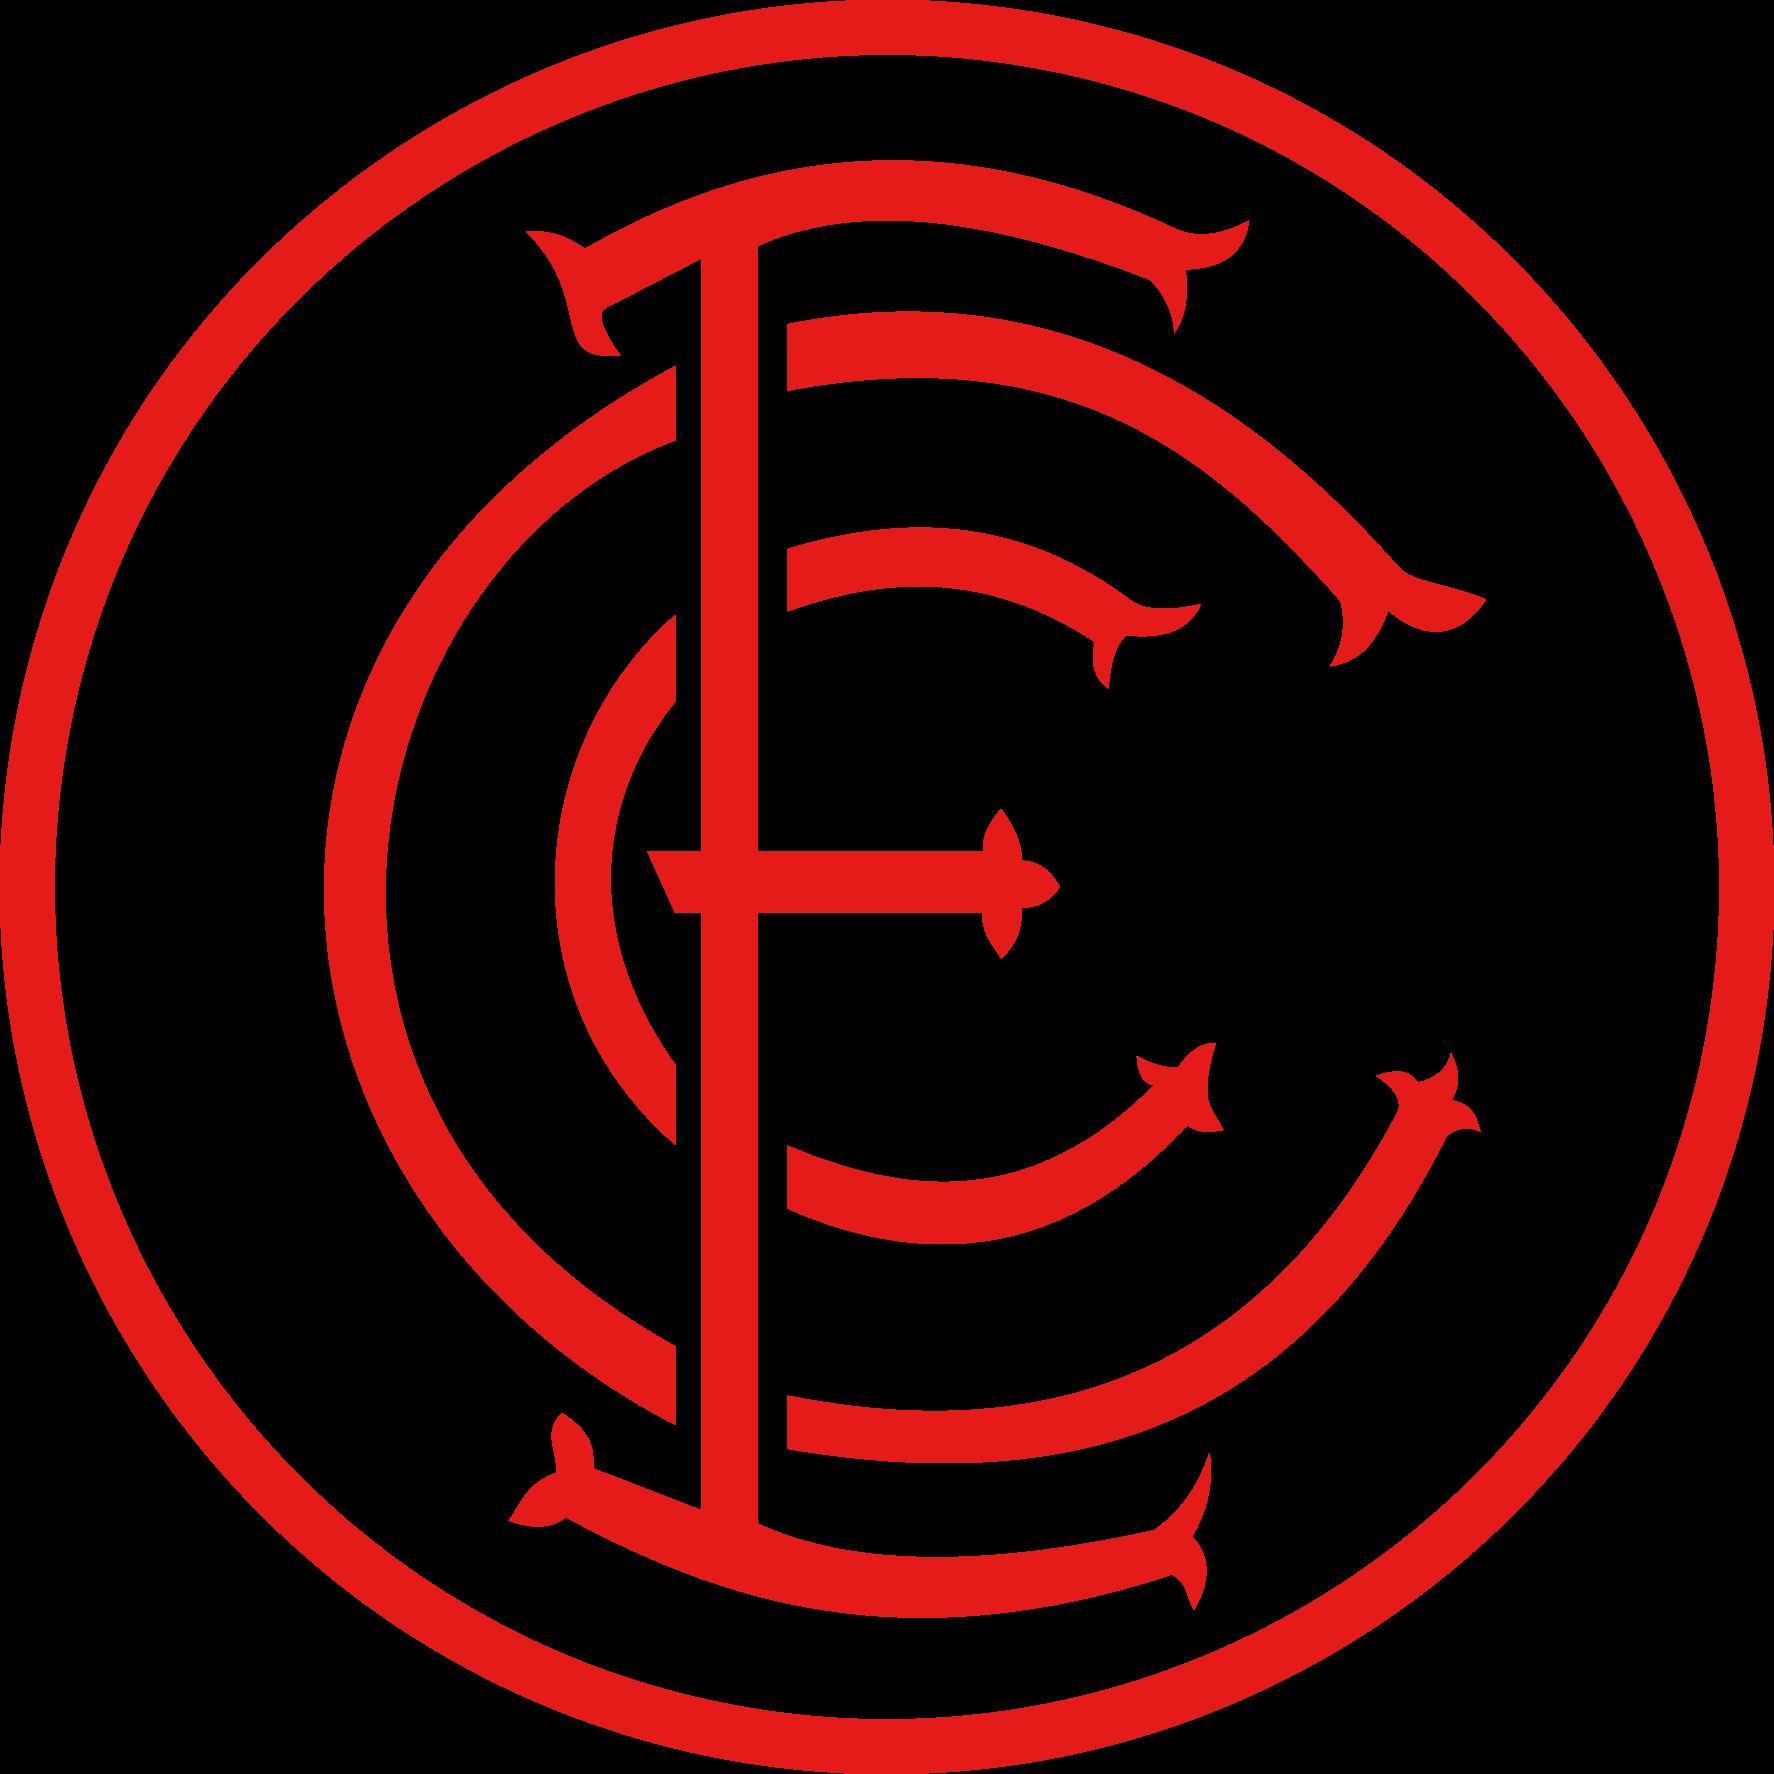 Esporte Clube Colorado